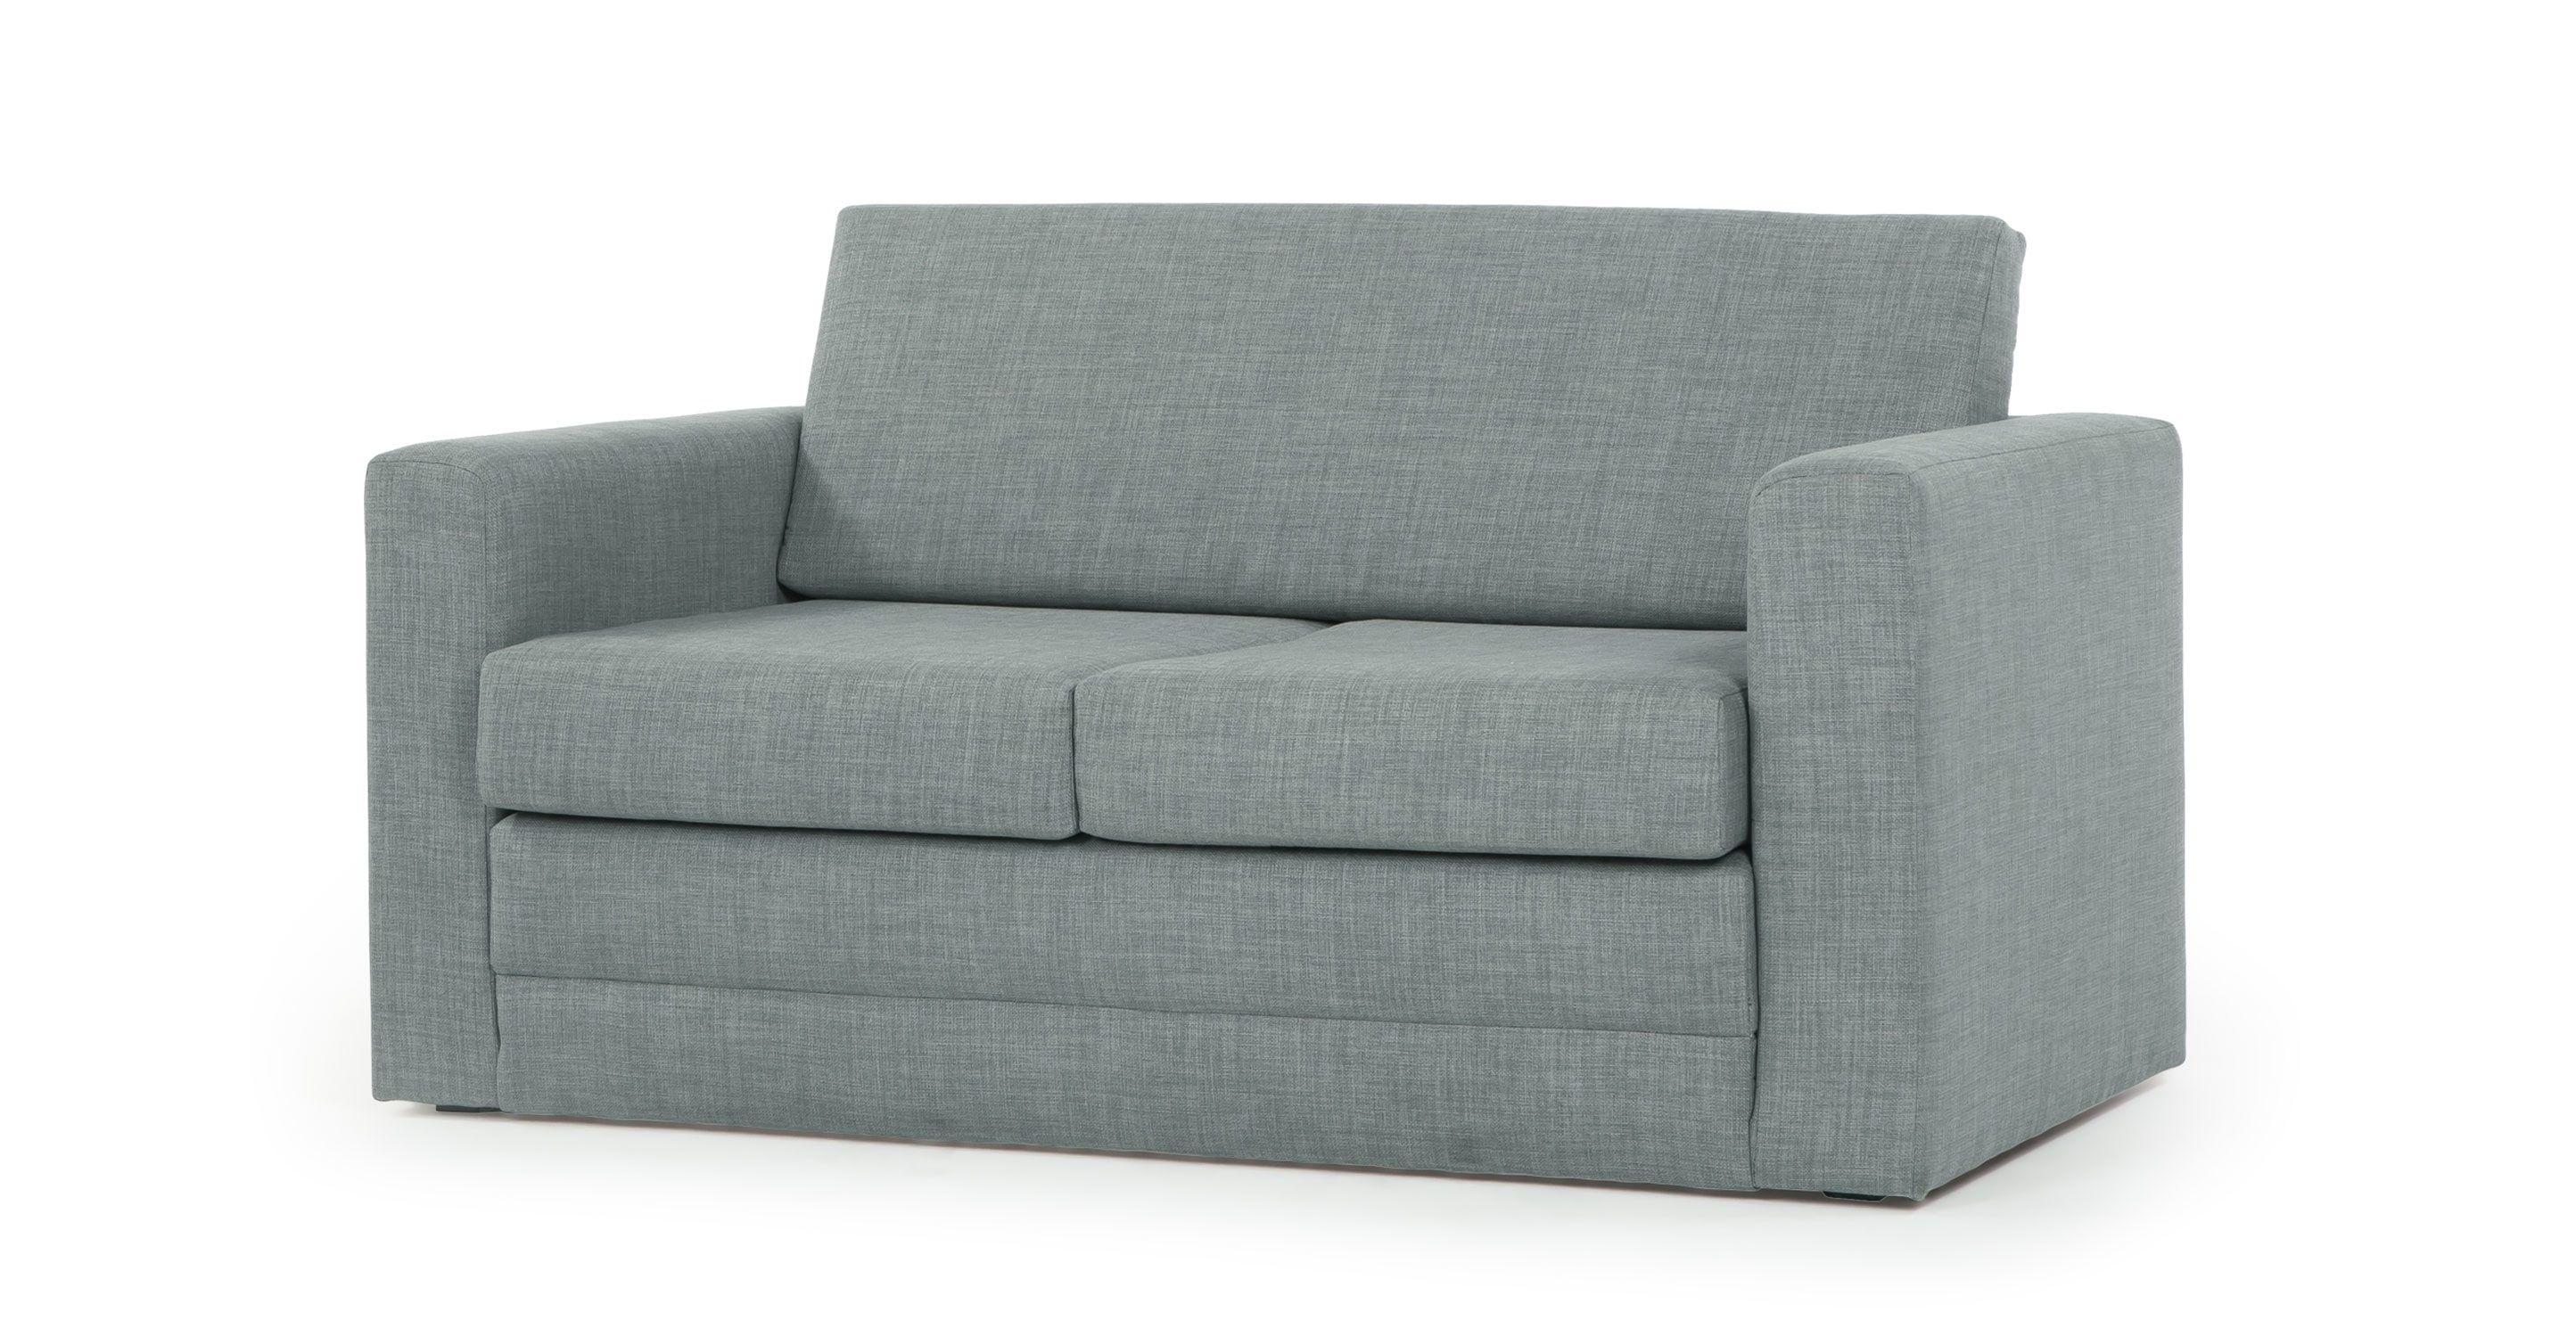 Elvin Sofa Bed In Venetian Blue